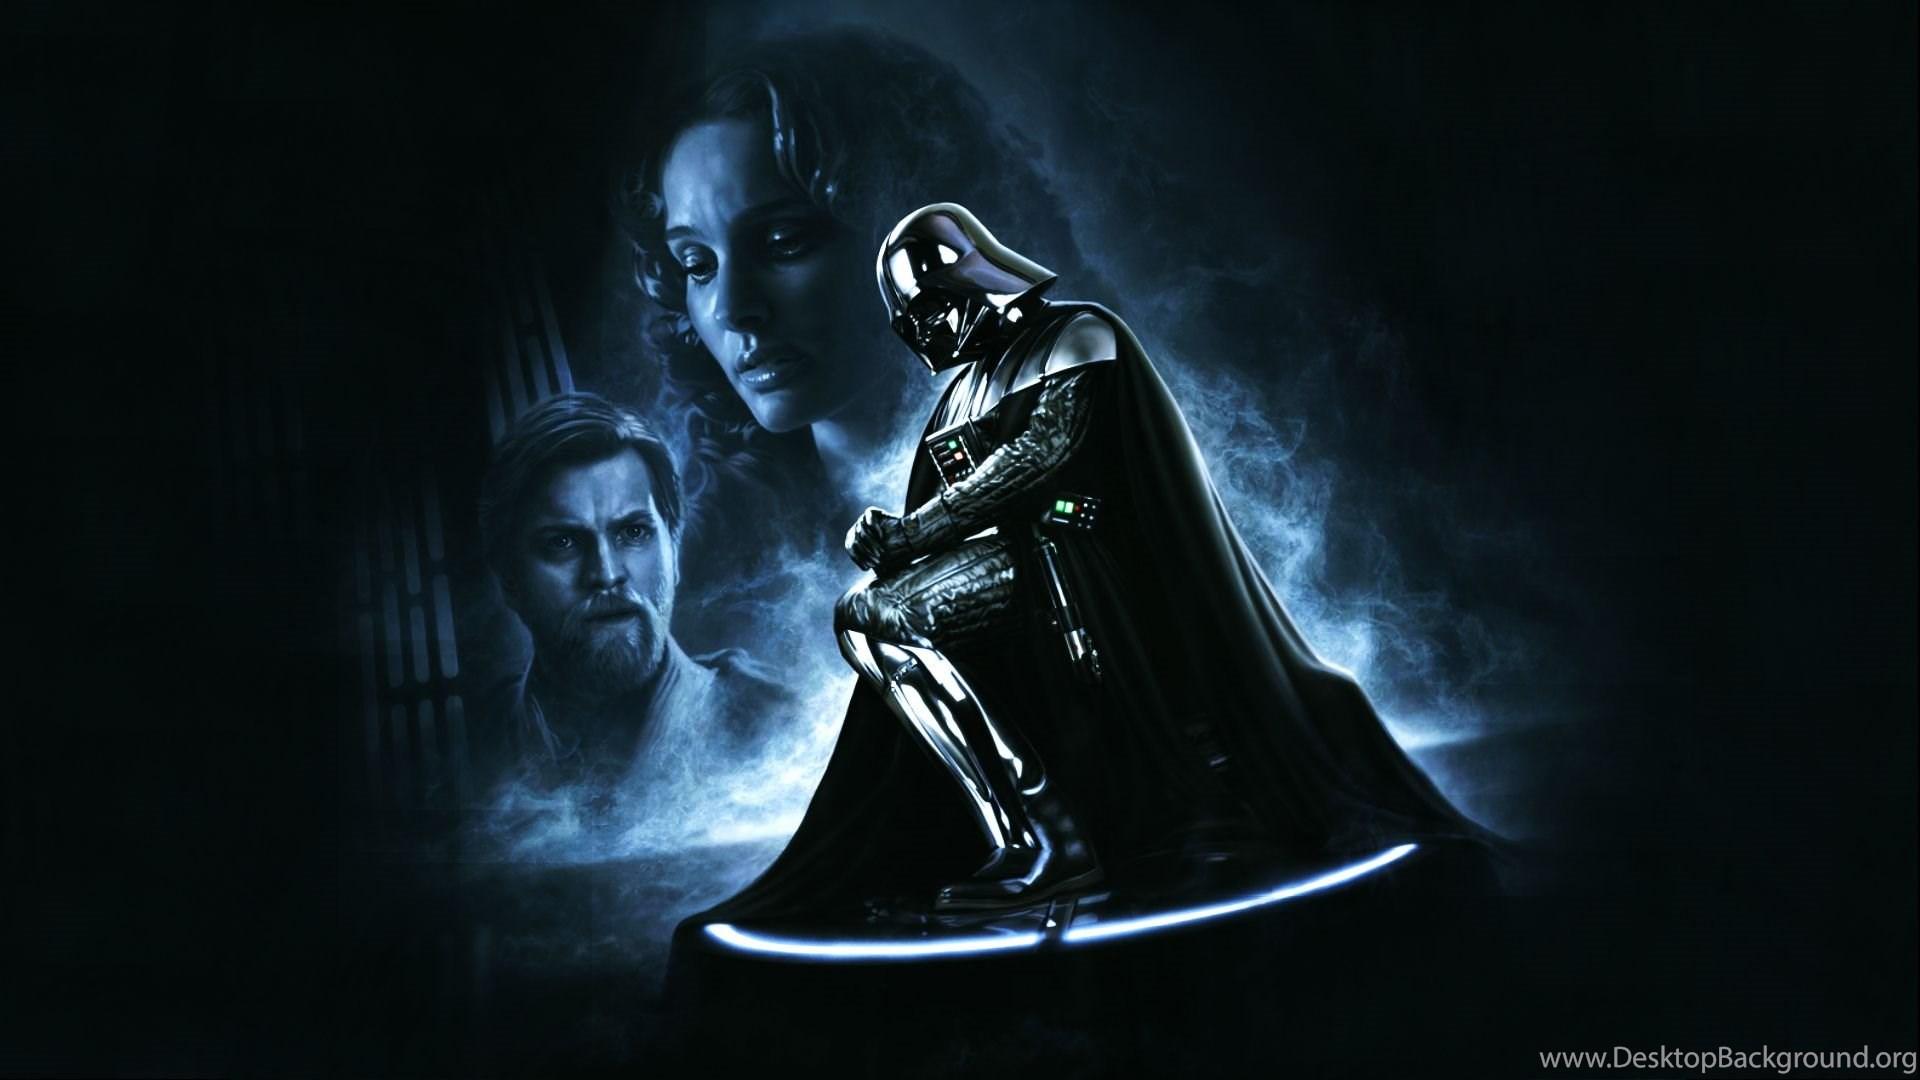 Download Star Wars Hd Wallpapers Darth Vader Free Wordpress Plugins